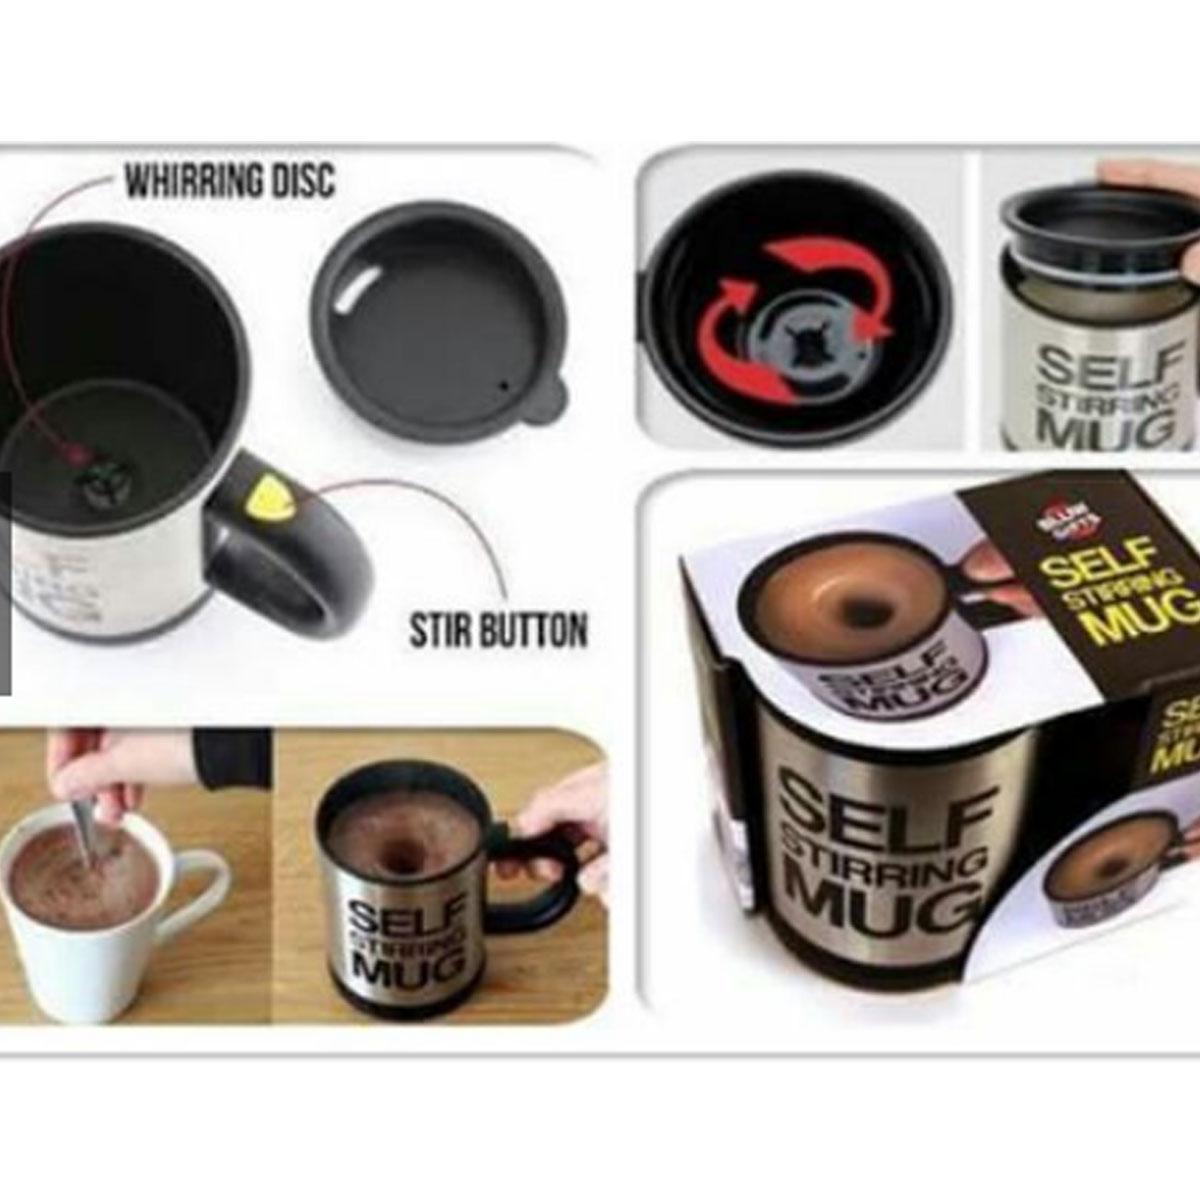 Self Stirring Coffee Cup/Mug Stainless Steel Gallery Image 1